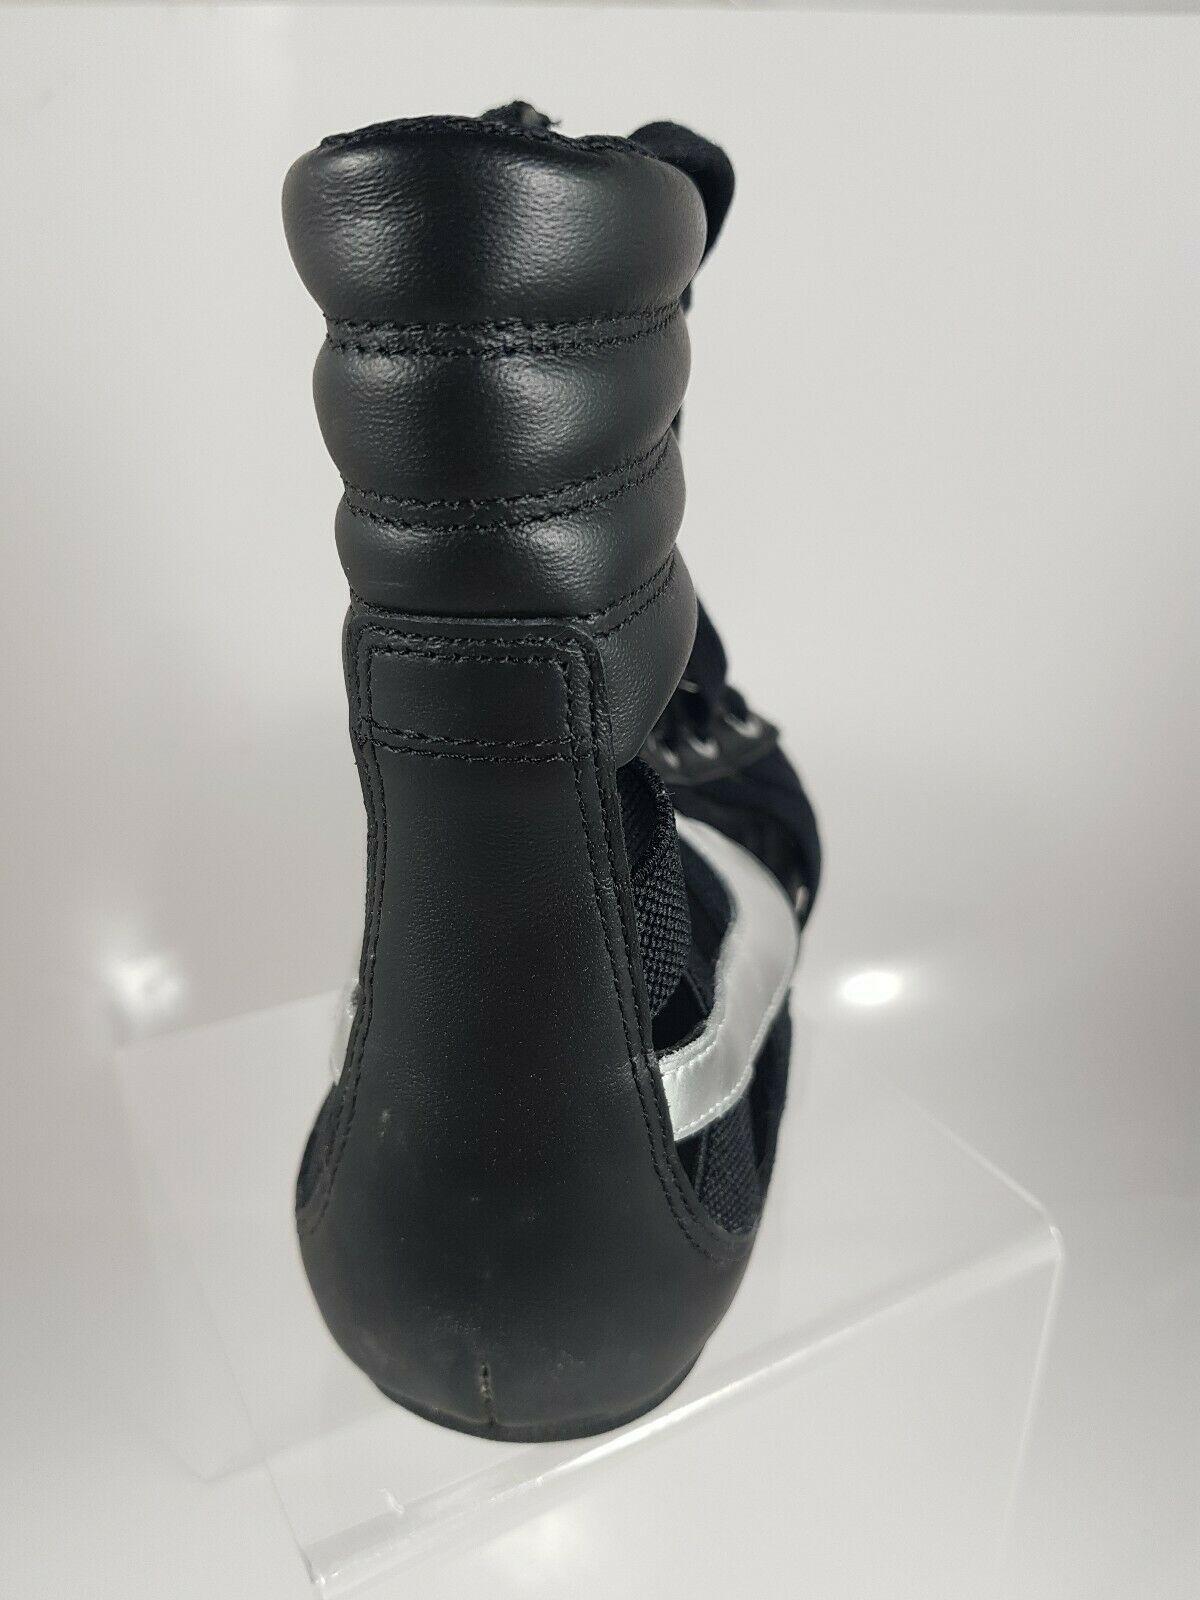 NIKE WOMEN'S SANDALS GLADIATEUR II Leather BLACK/METALLIC SILVER 429881 003 image 4